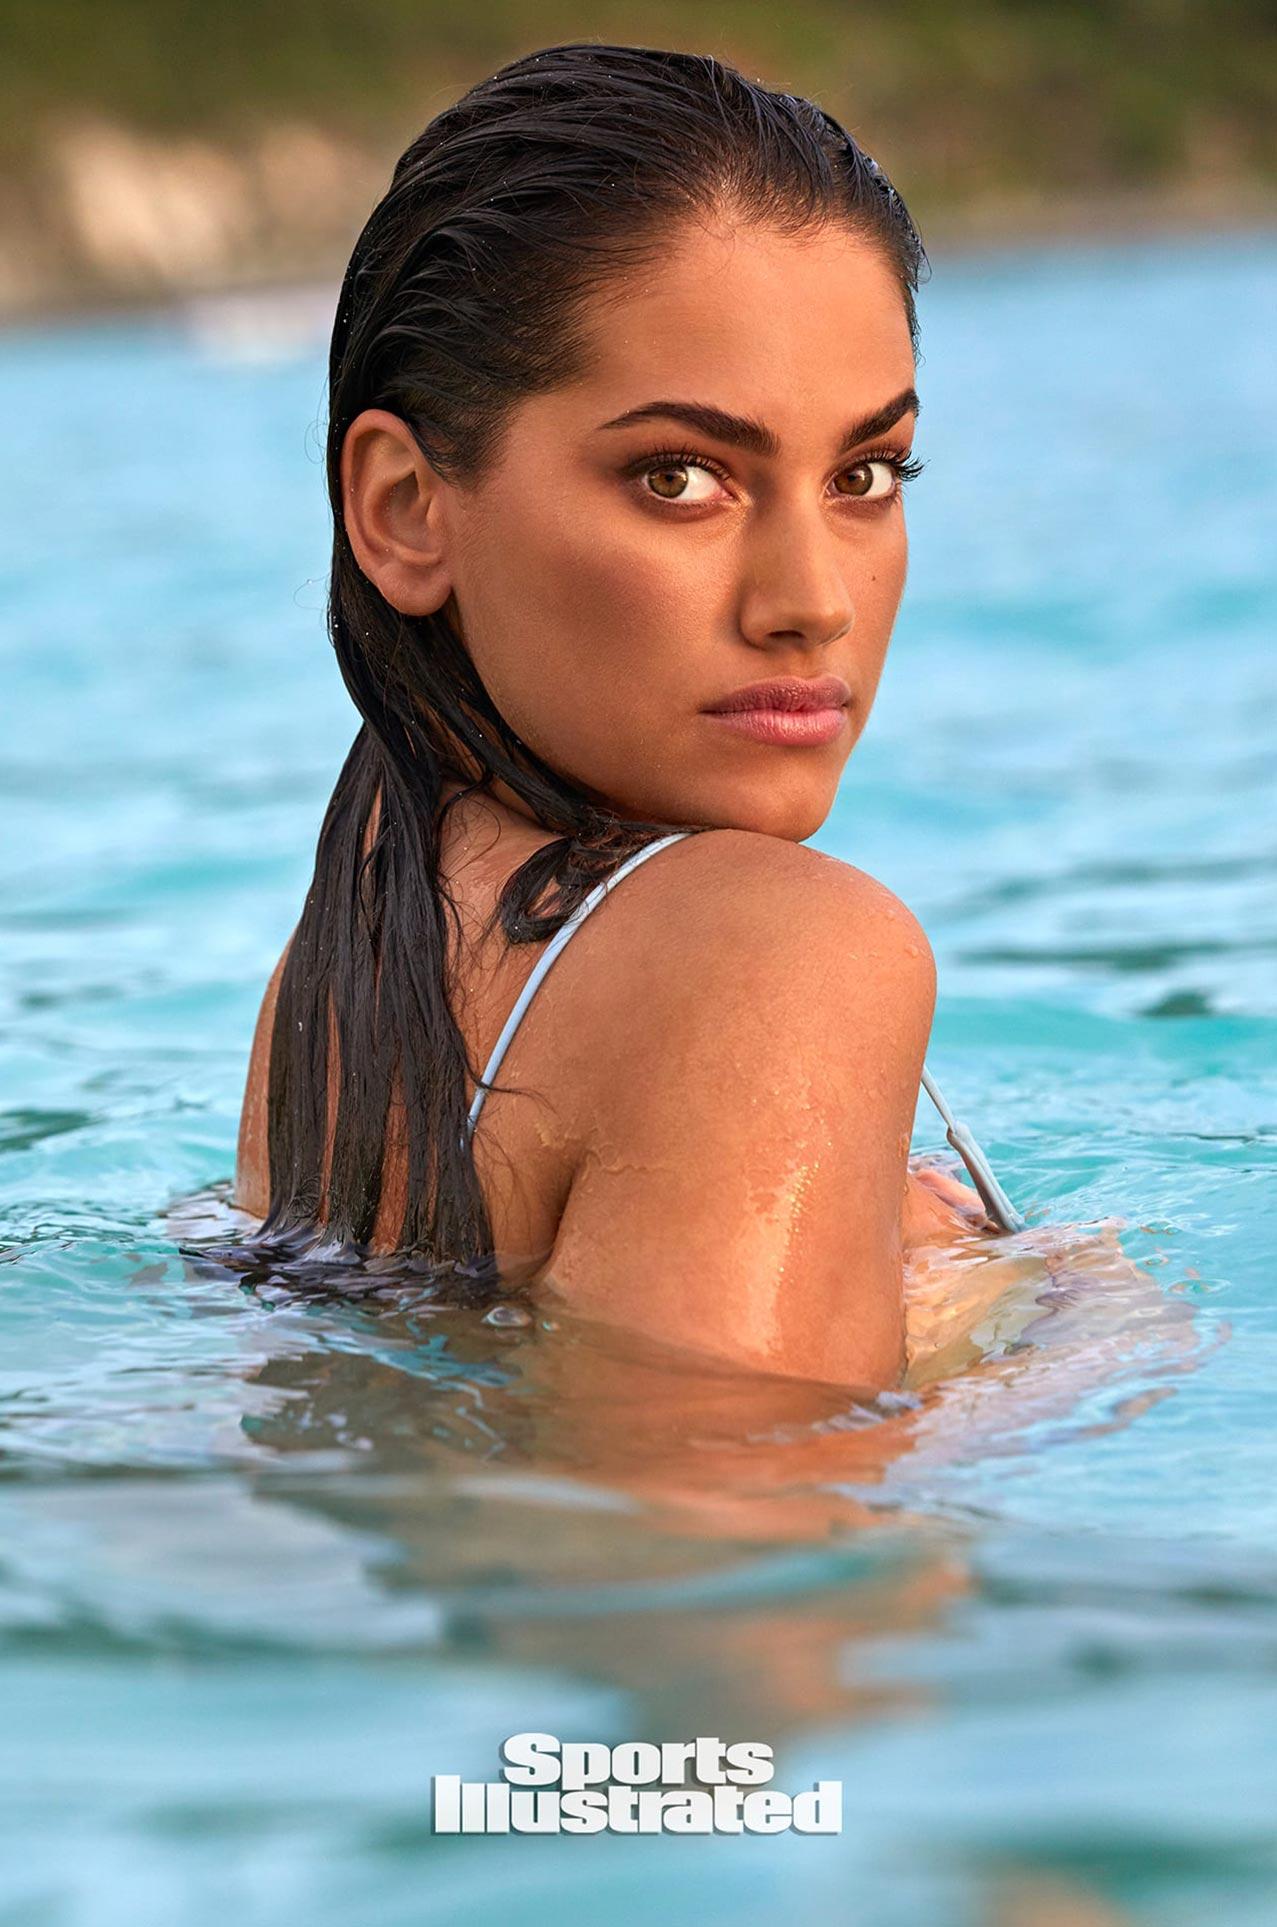 Лорена Дюран в каталоге купальников Sports Illustrated Swimsuit 2020 / фото 26